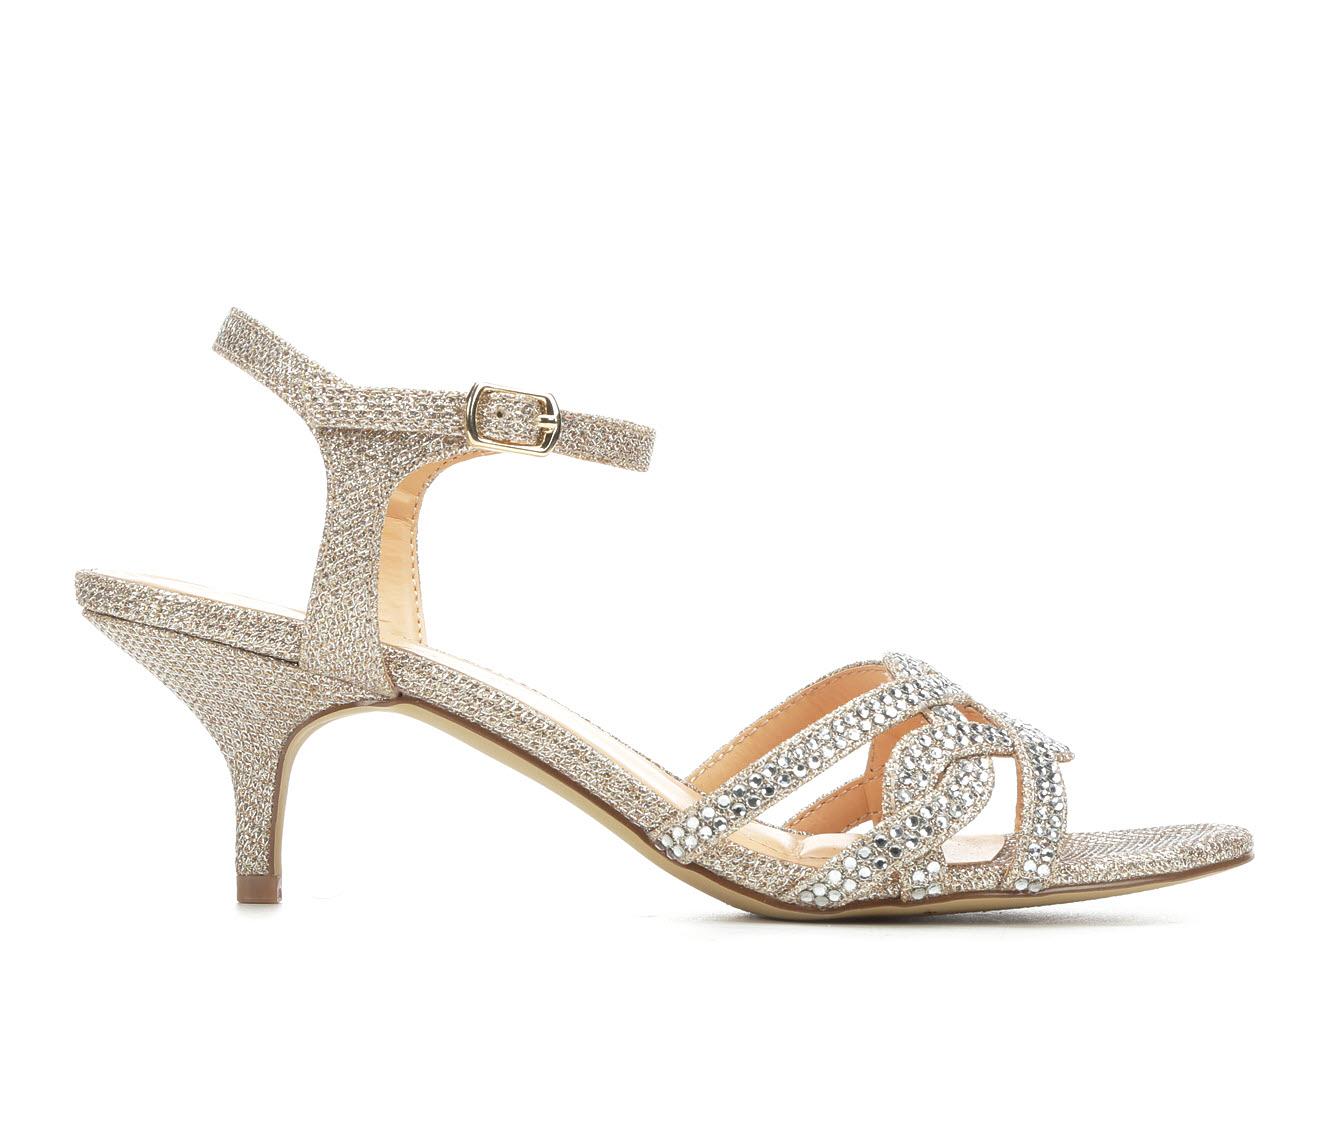 American Glamour BadgleyM Xabrina Women's Dress Shoe (Gold Canvas)